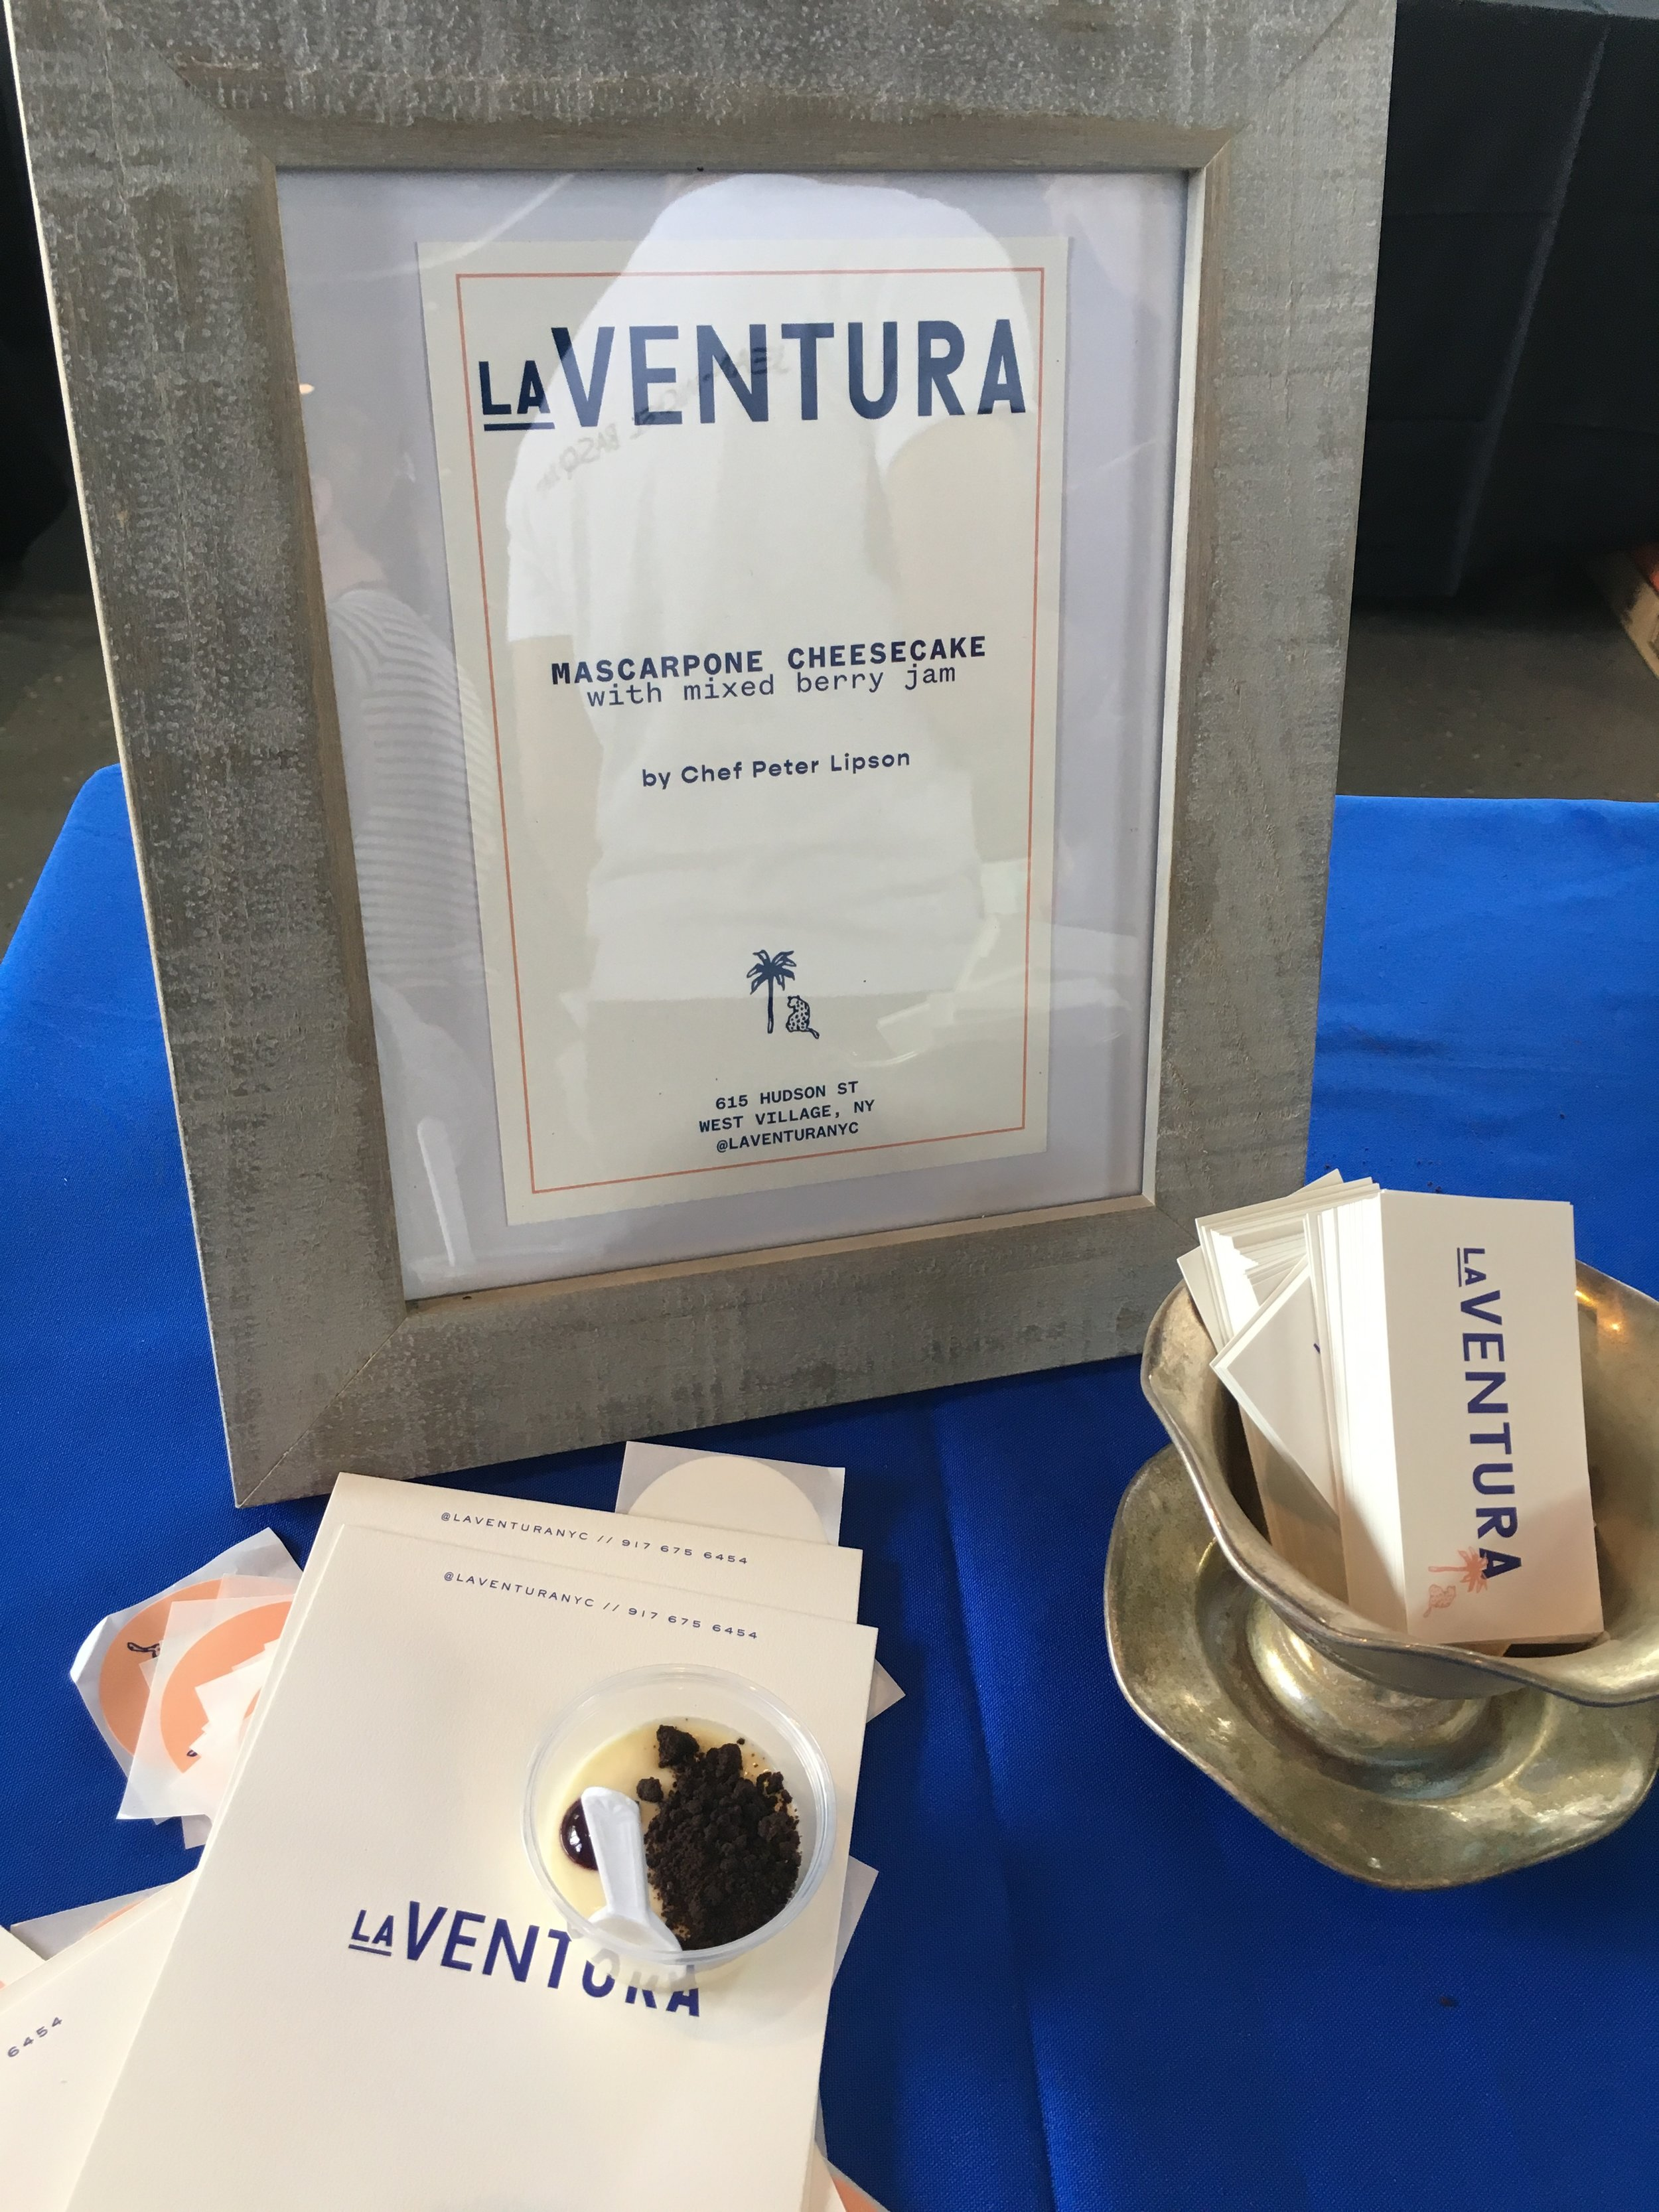 Mascarpone Cheesecake with mixed berry jam by La Ventura